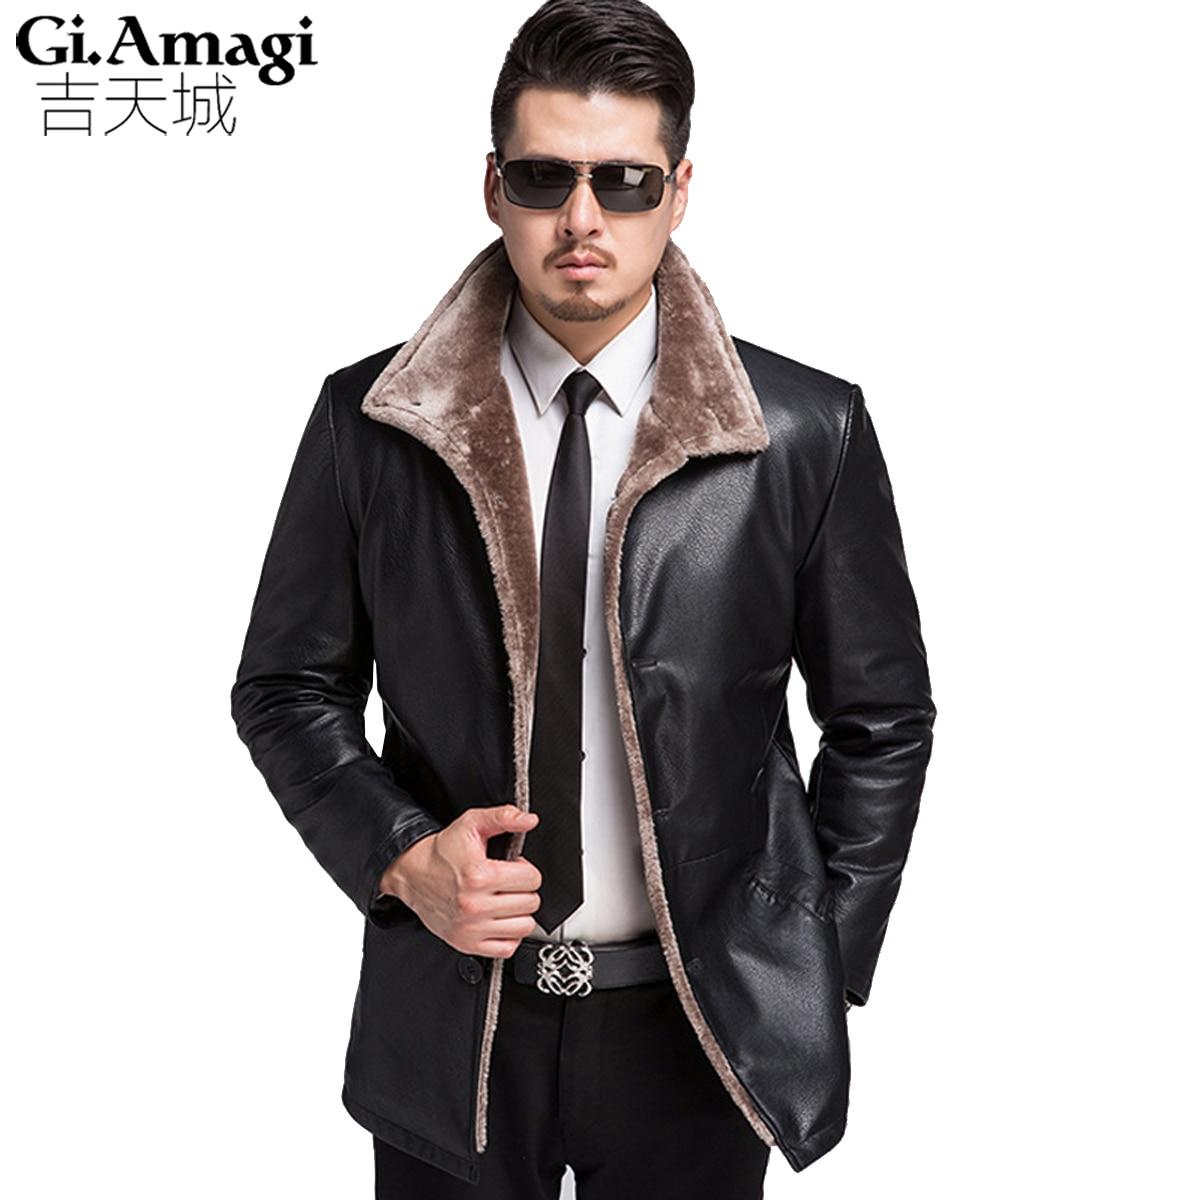 Mens Smart Casual Fashion Winter Thick leather jacket Men Garment flocking Black and Brown Faux Fur High Qualit Men Coat 3XL